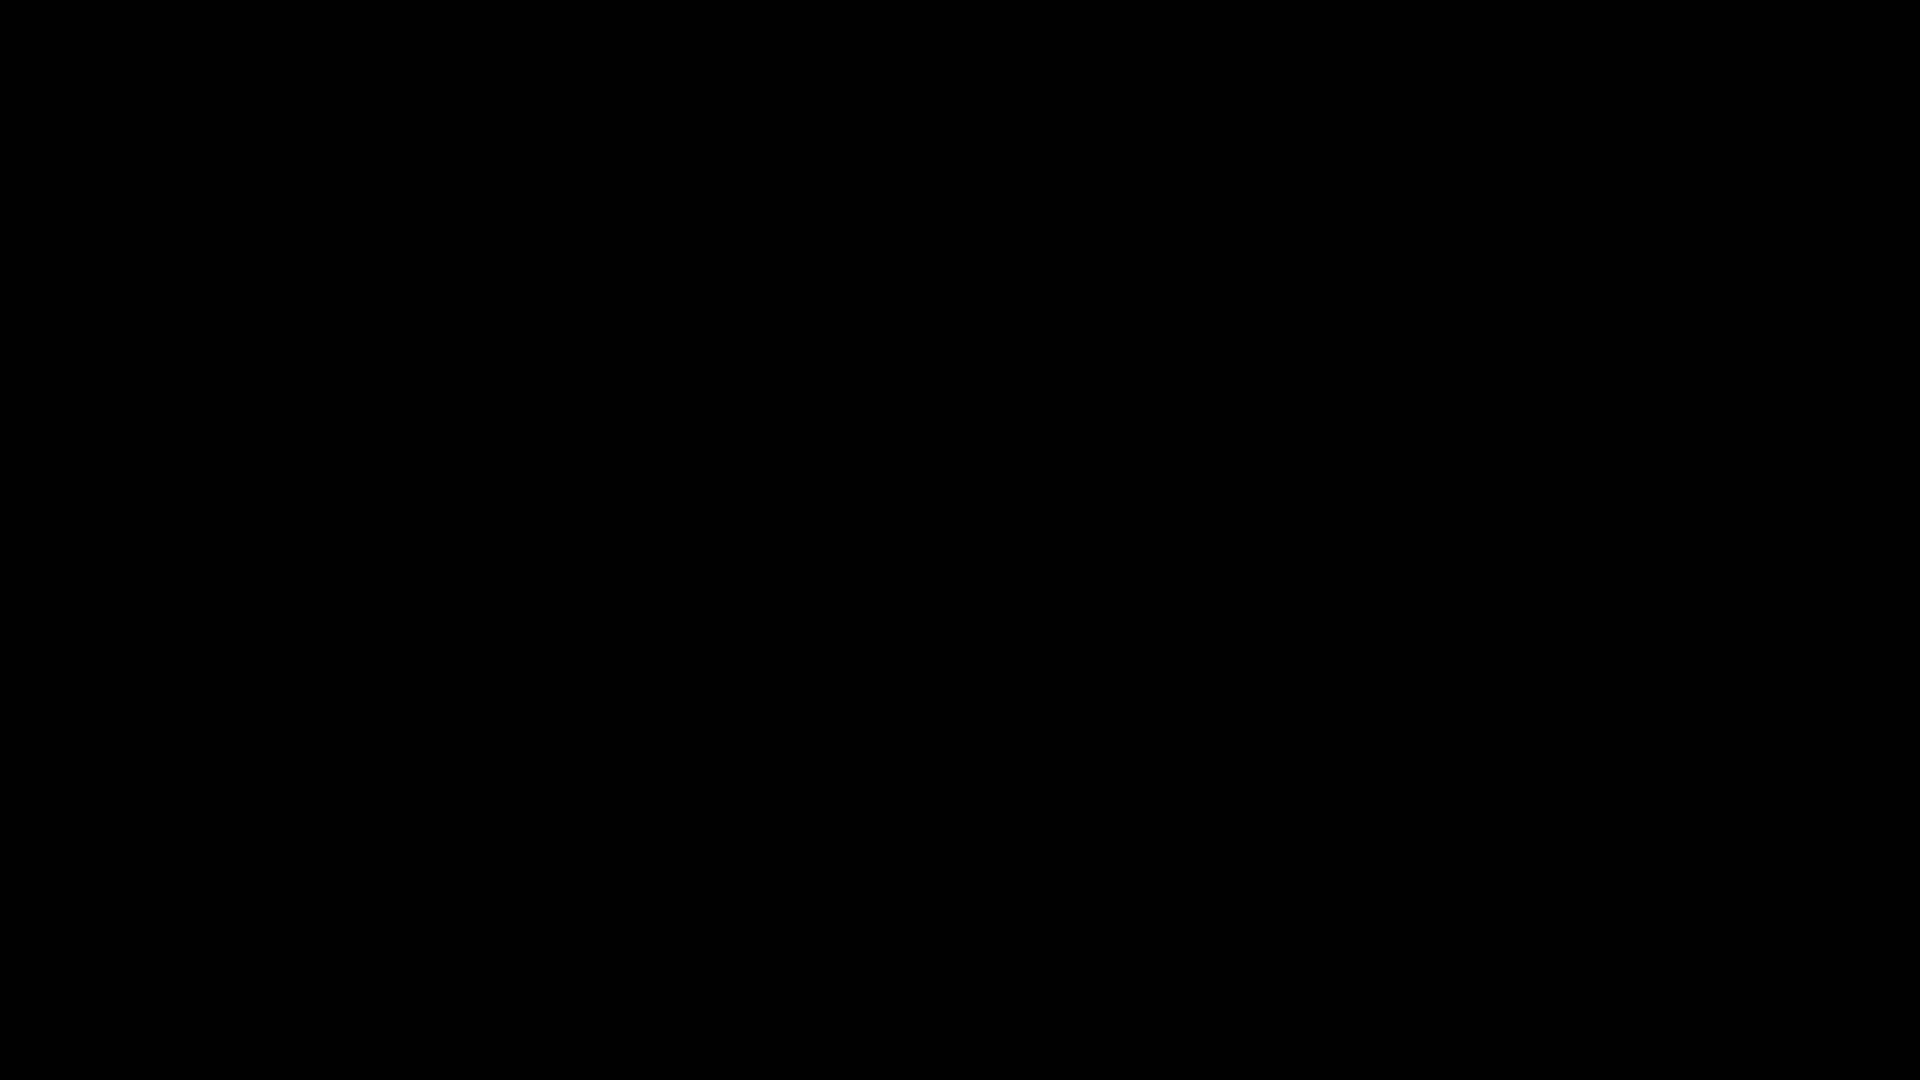 "KiriNavi WC-HC1012 10.2 ""Android 6.0เครื่องเสียงรถยนต์รถบลูทูธวิทยุสำหรับฮอนด้าซีวิค2012-2014 Wifi 3กรัม"